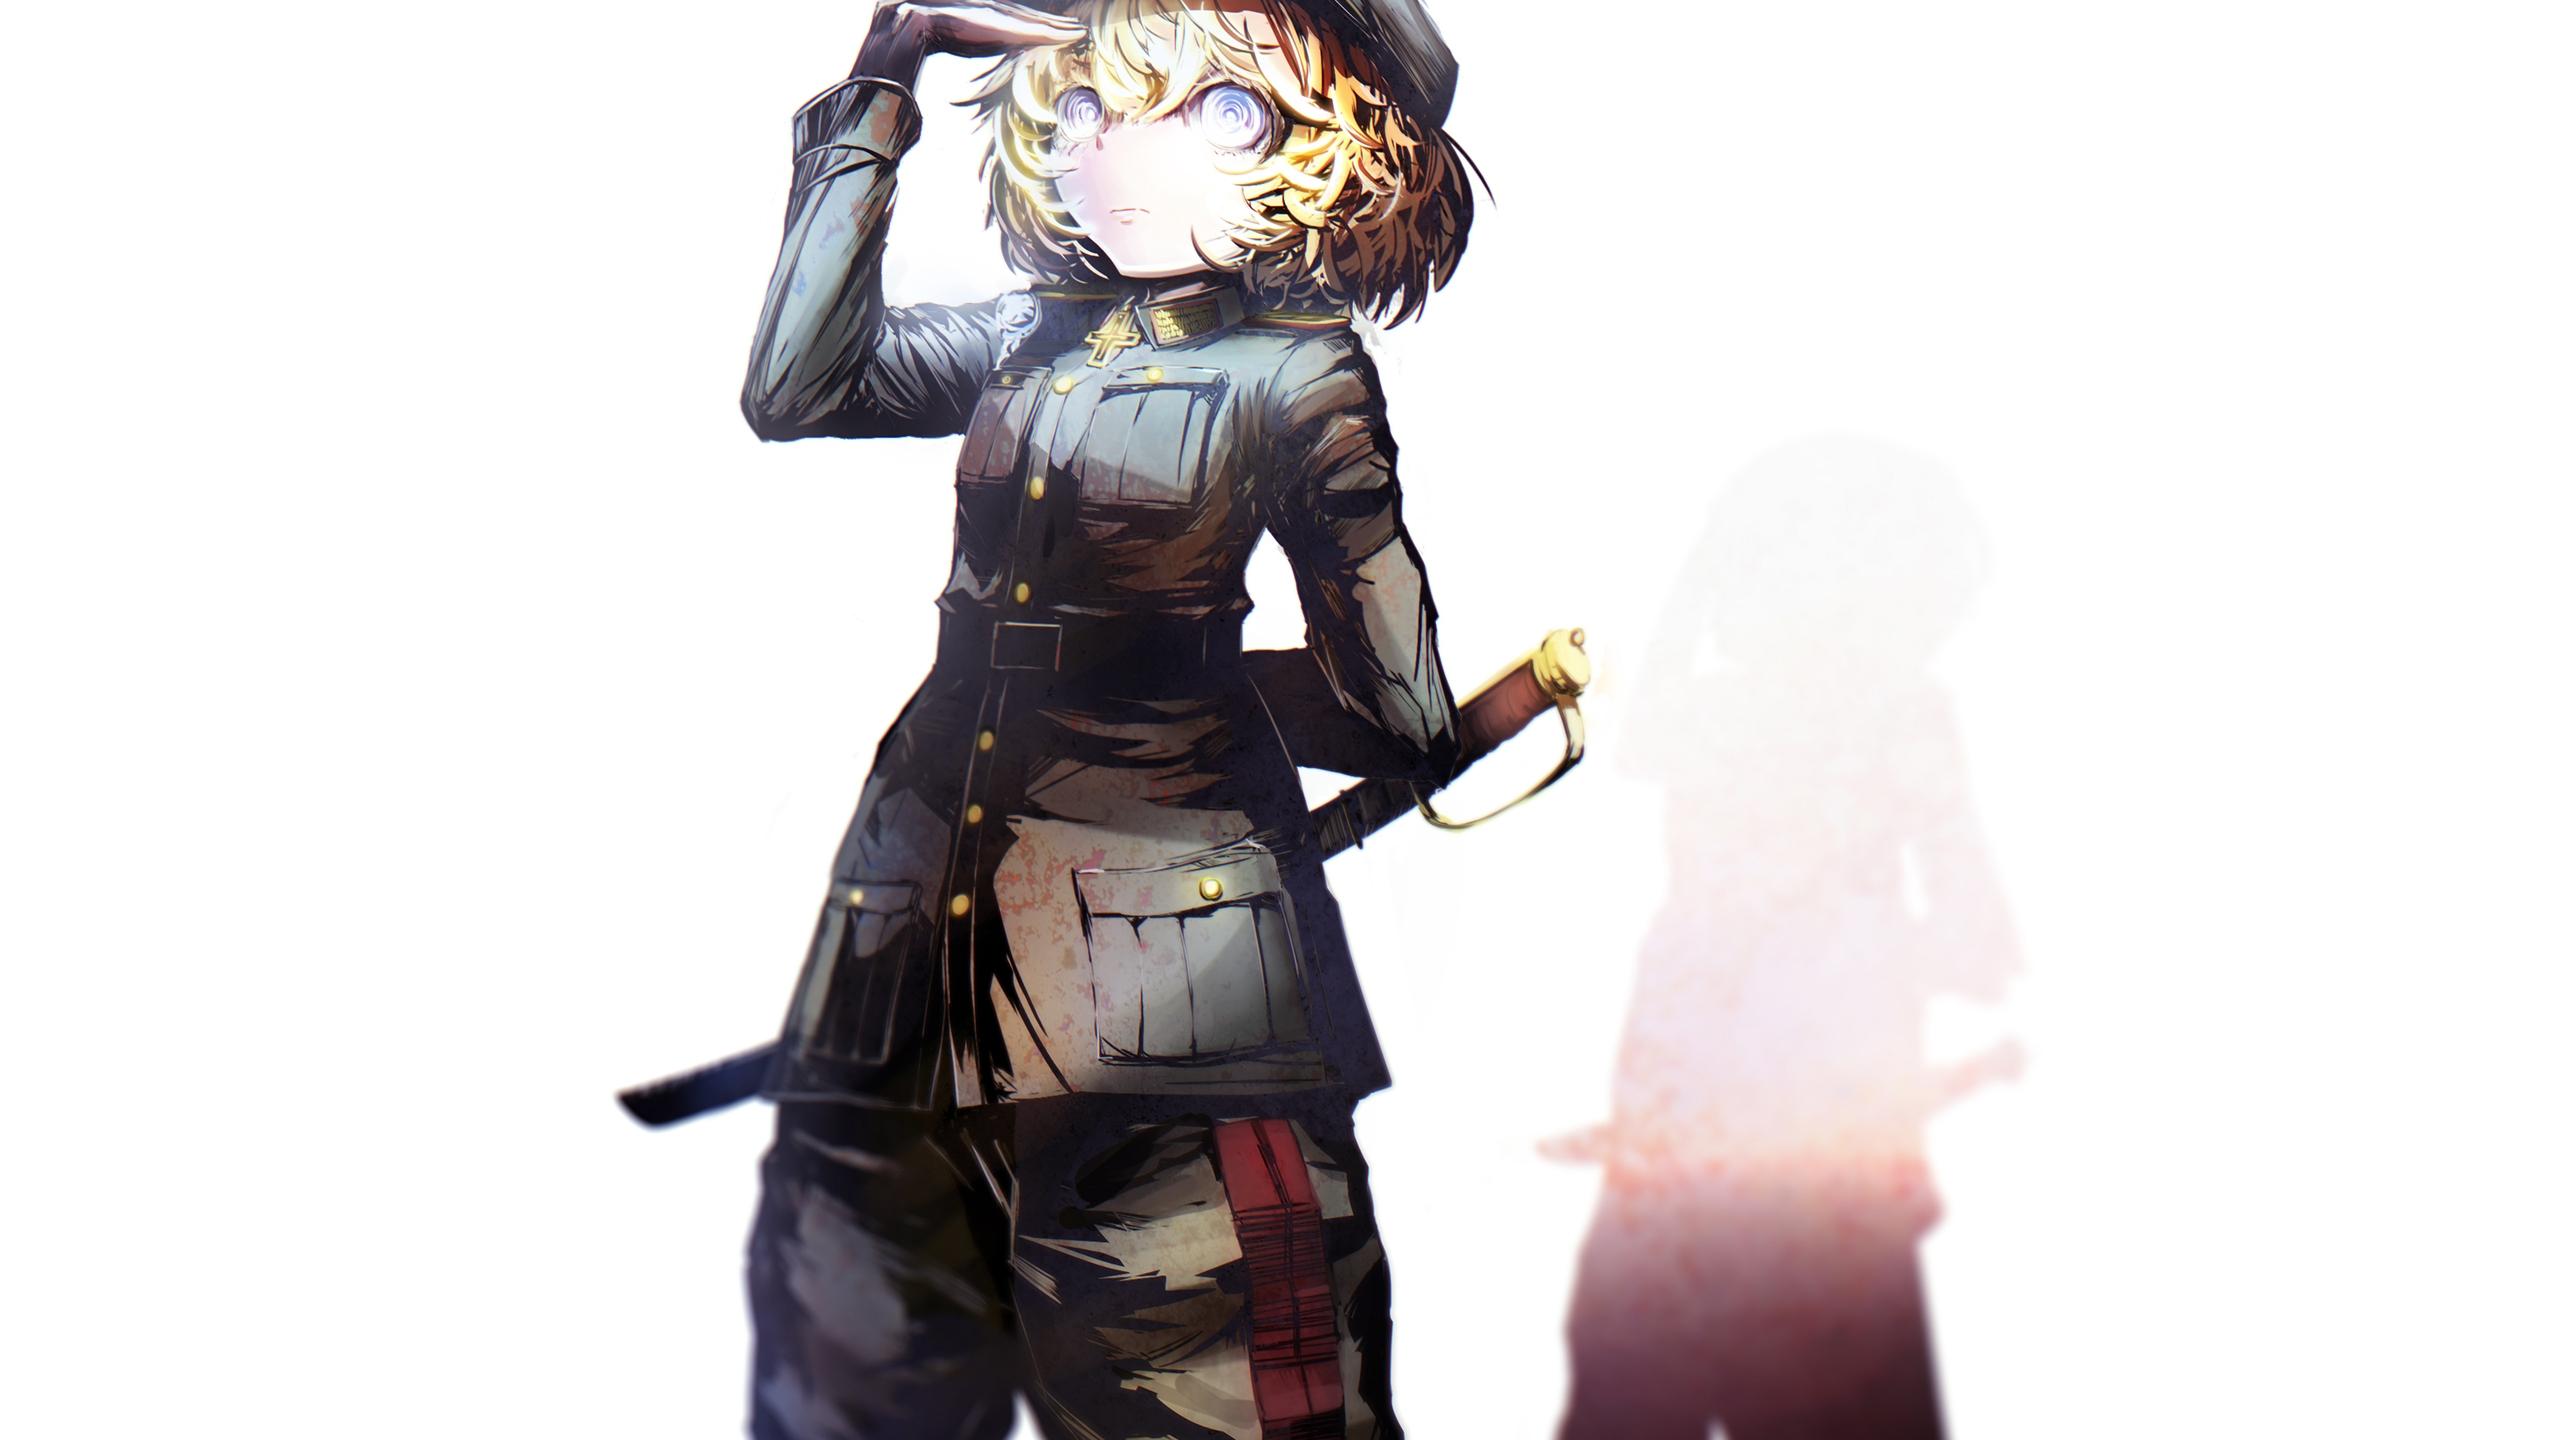 Desktop Wallpaper Tanya Of Youjo Senki Anime Hd Image Picture Background Rrbcmy